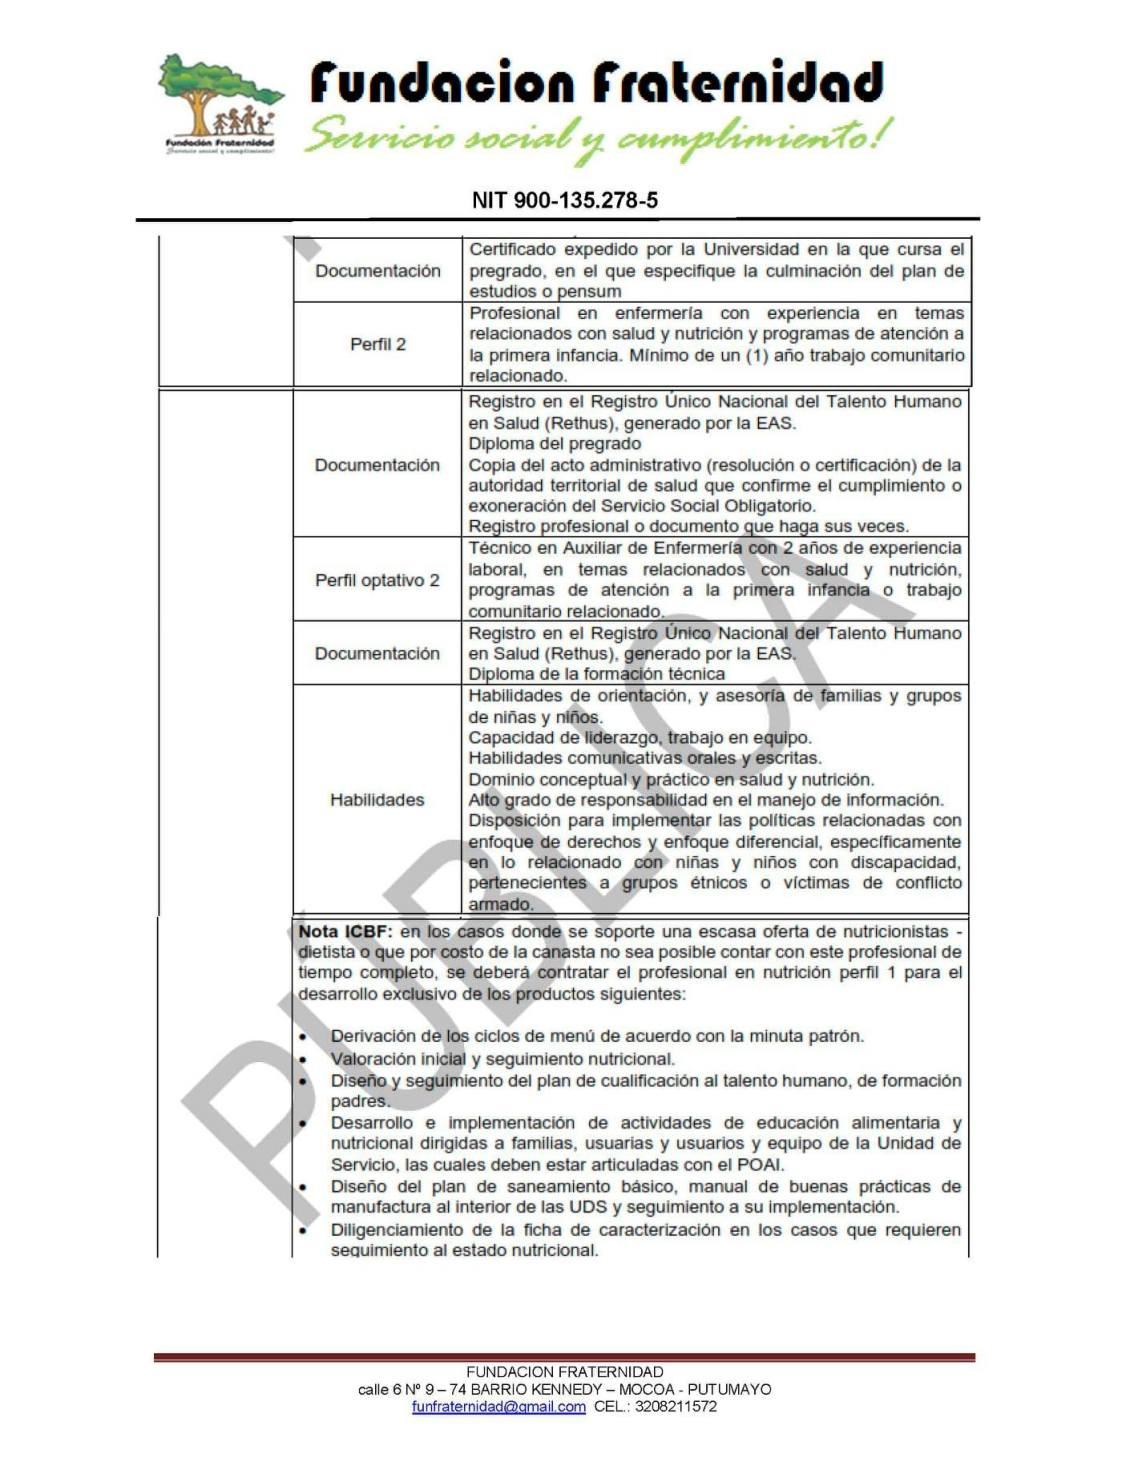 fundacion-fraternidad-abre-convocatoria-laboral-nro-002-2021-4